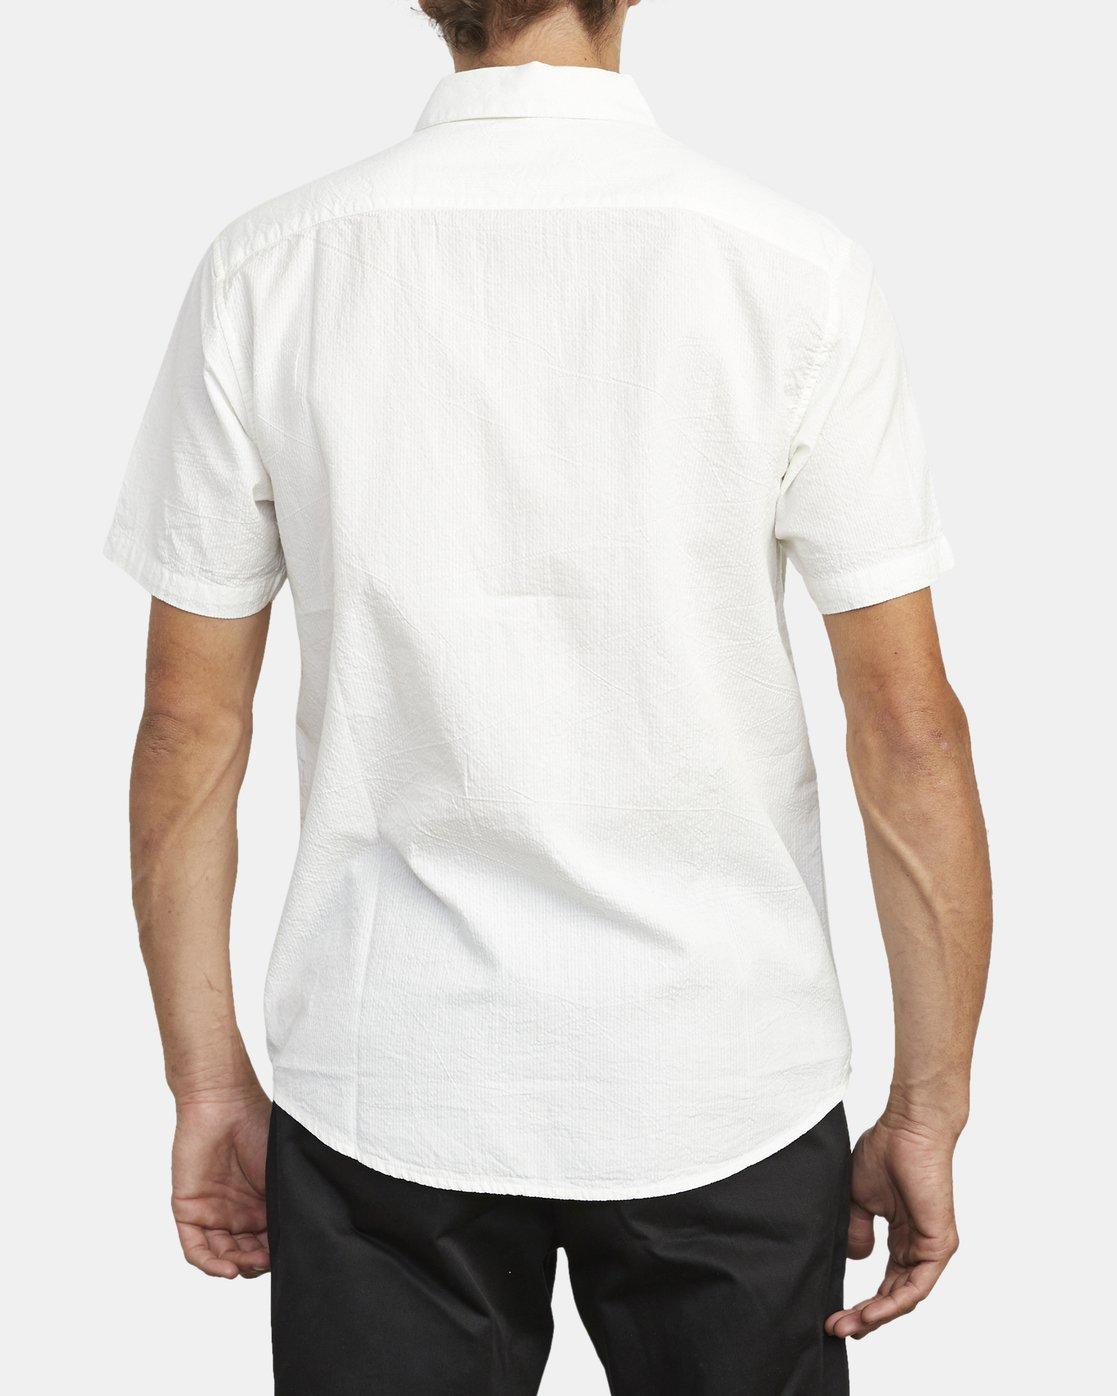 1 ENDLESS SEERSUCKER PRINT SHORT SLEEVE SHIRT White M5192REP RVCA